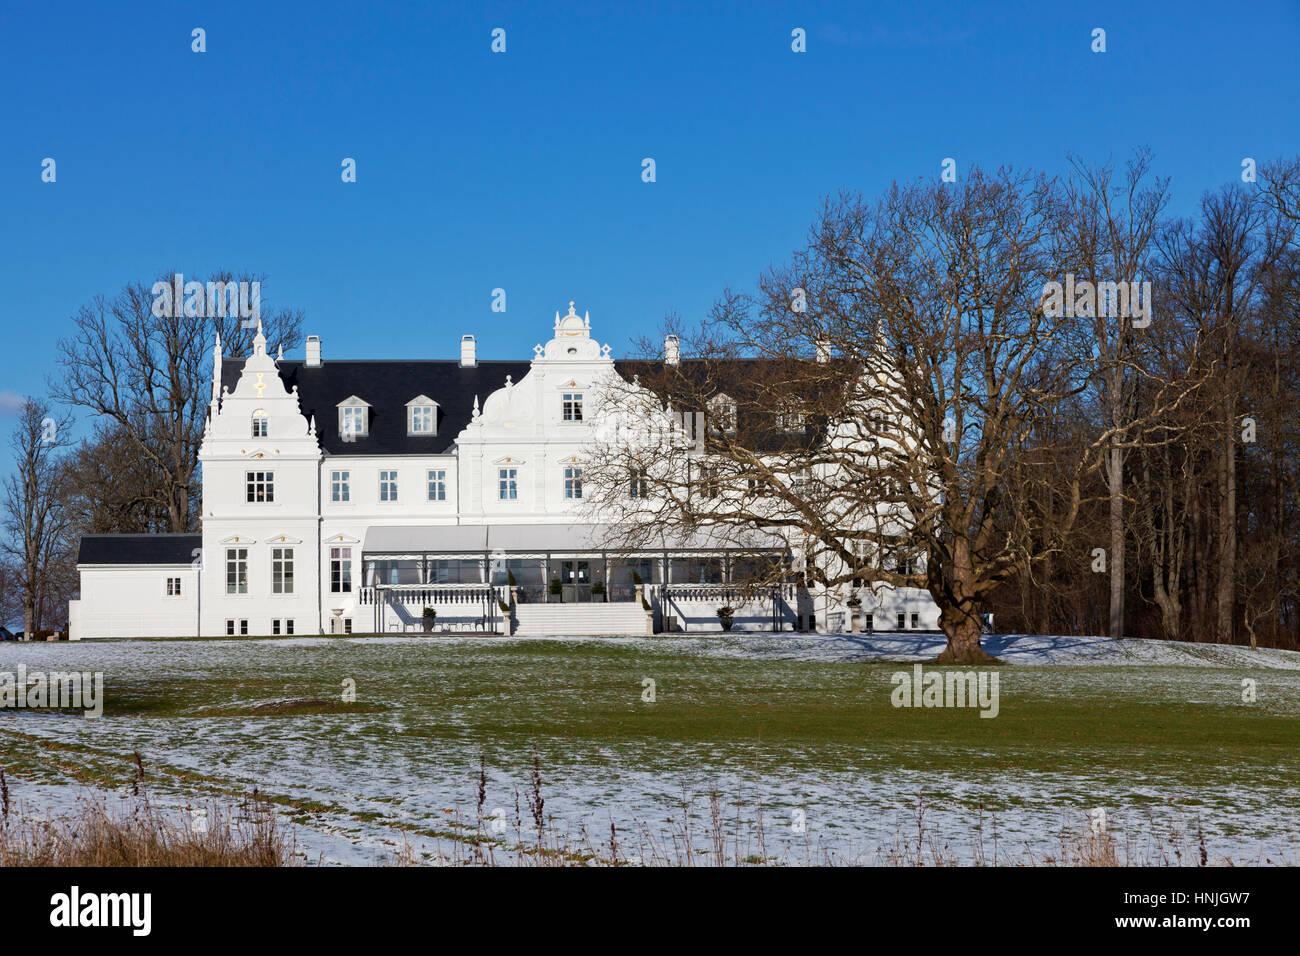 Kokkedal Castle Copenhagen, a luxurious castle hotel in winter landscape, a big, old leafless tree in front. Kokkedal - Stock Image